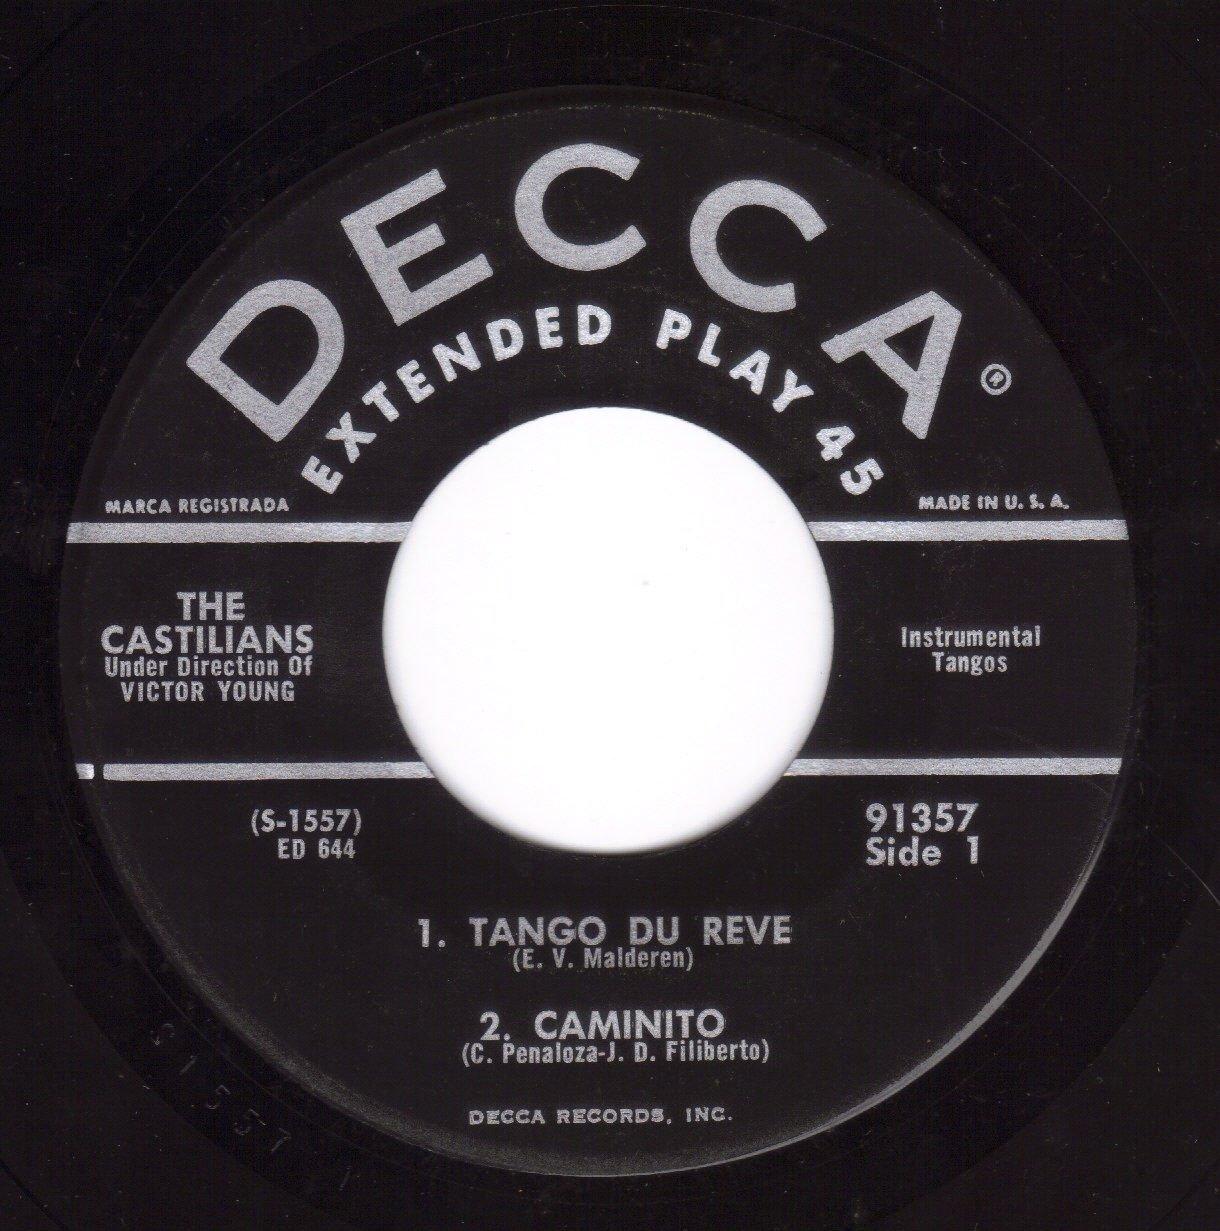 Tango Du Reve/Caminito/Yira/Fate/La Rosita/Queja Pampera/Adios Muchachos/Donde Estas Corazon (VG EP PS & 45 rpm) by DECCA